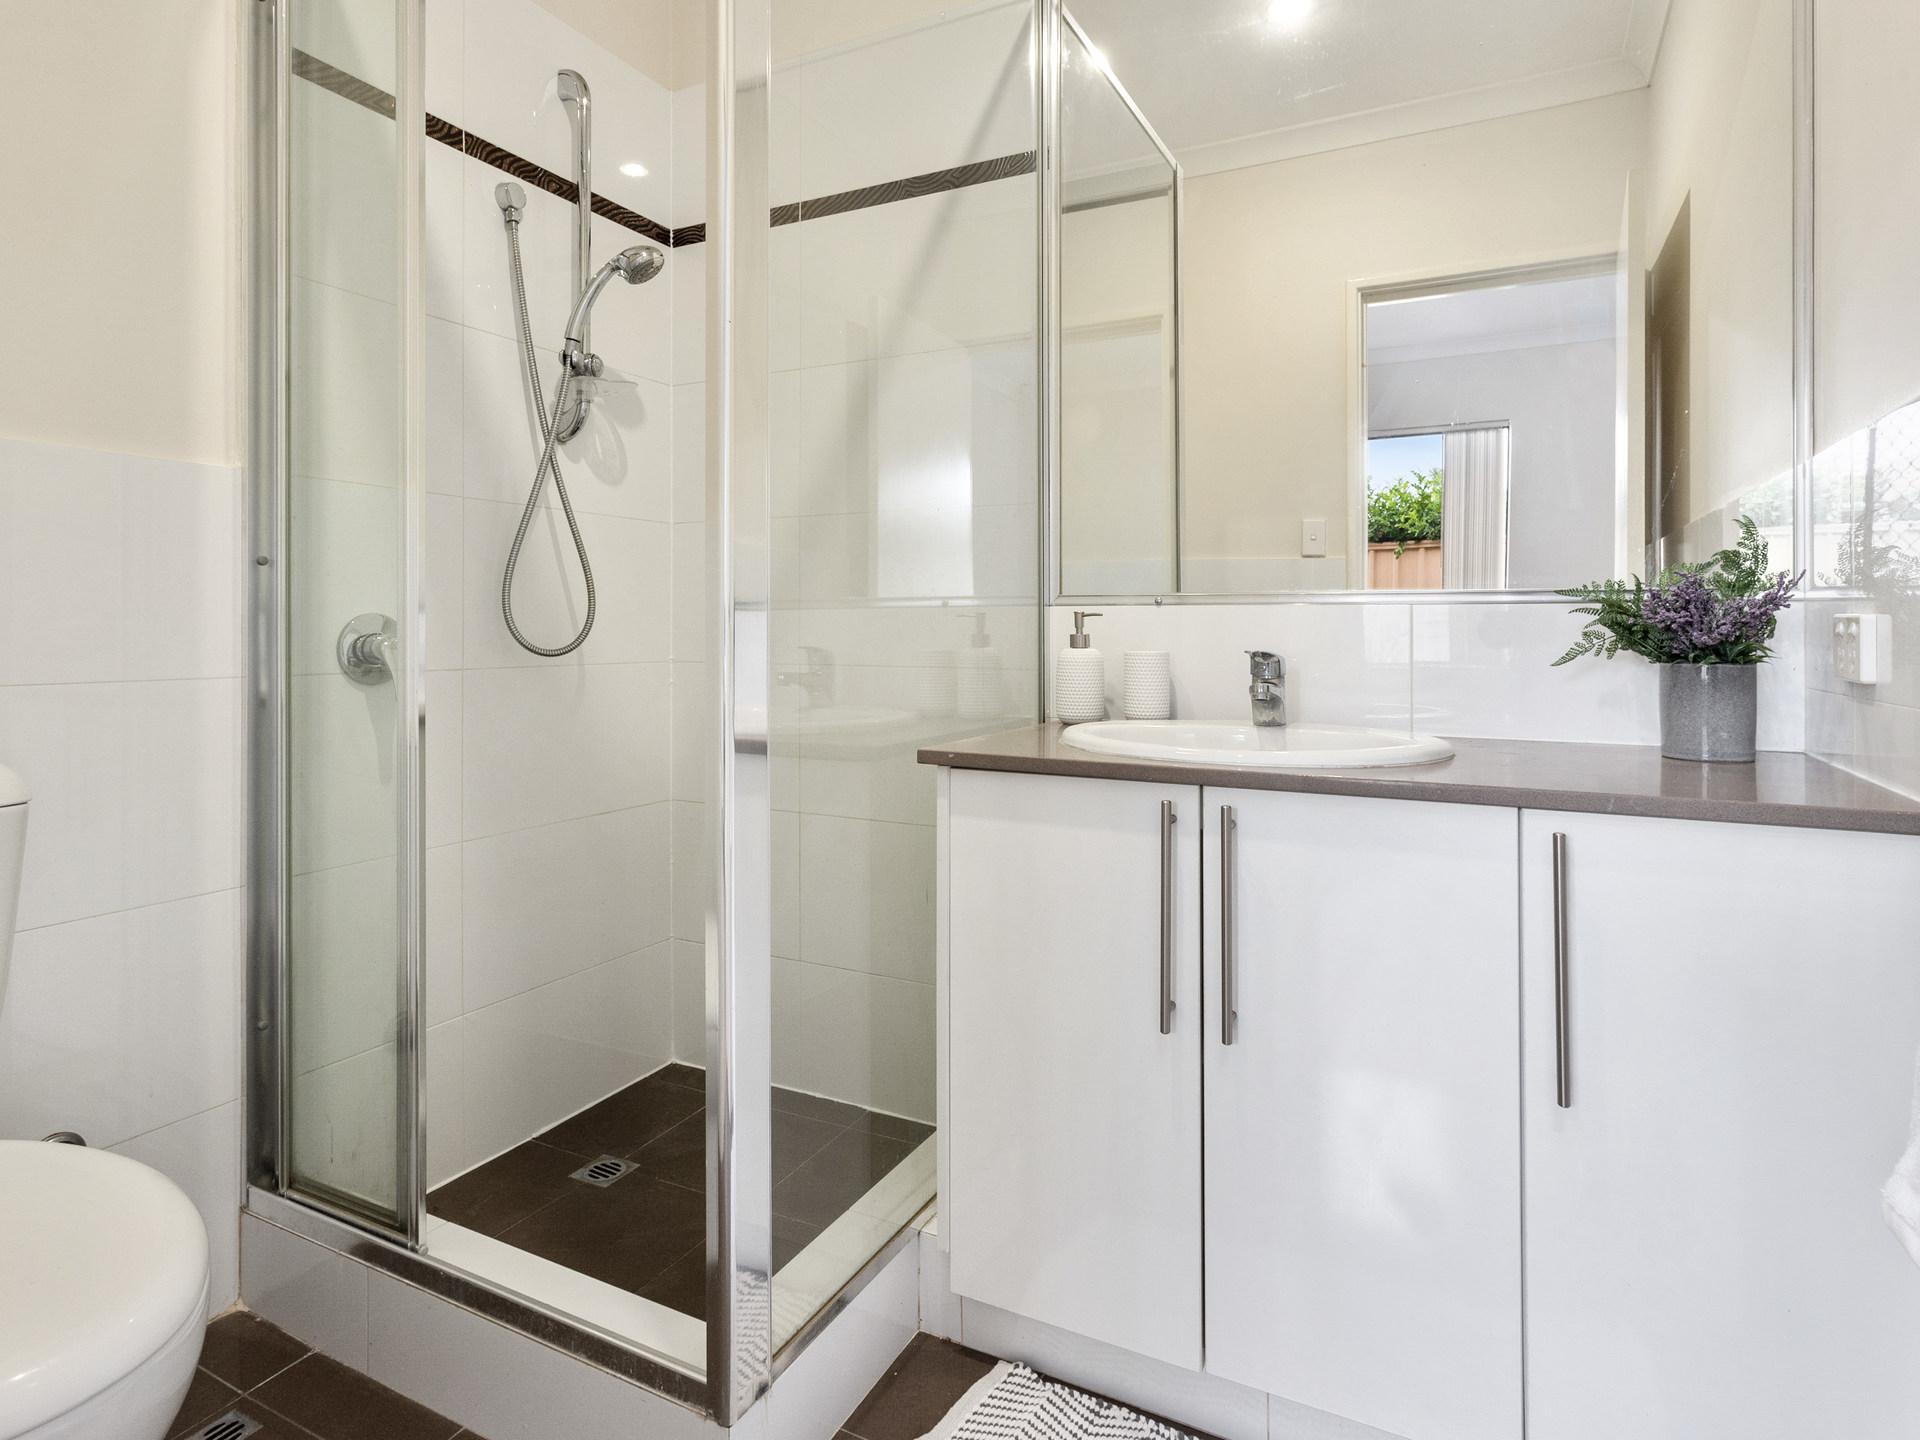 Room 5 Hopkinson Bath